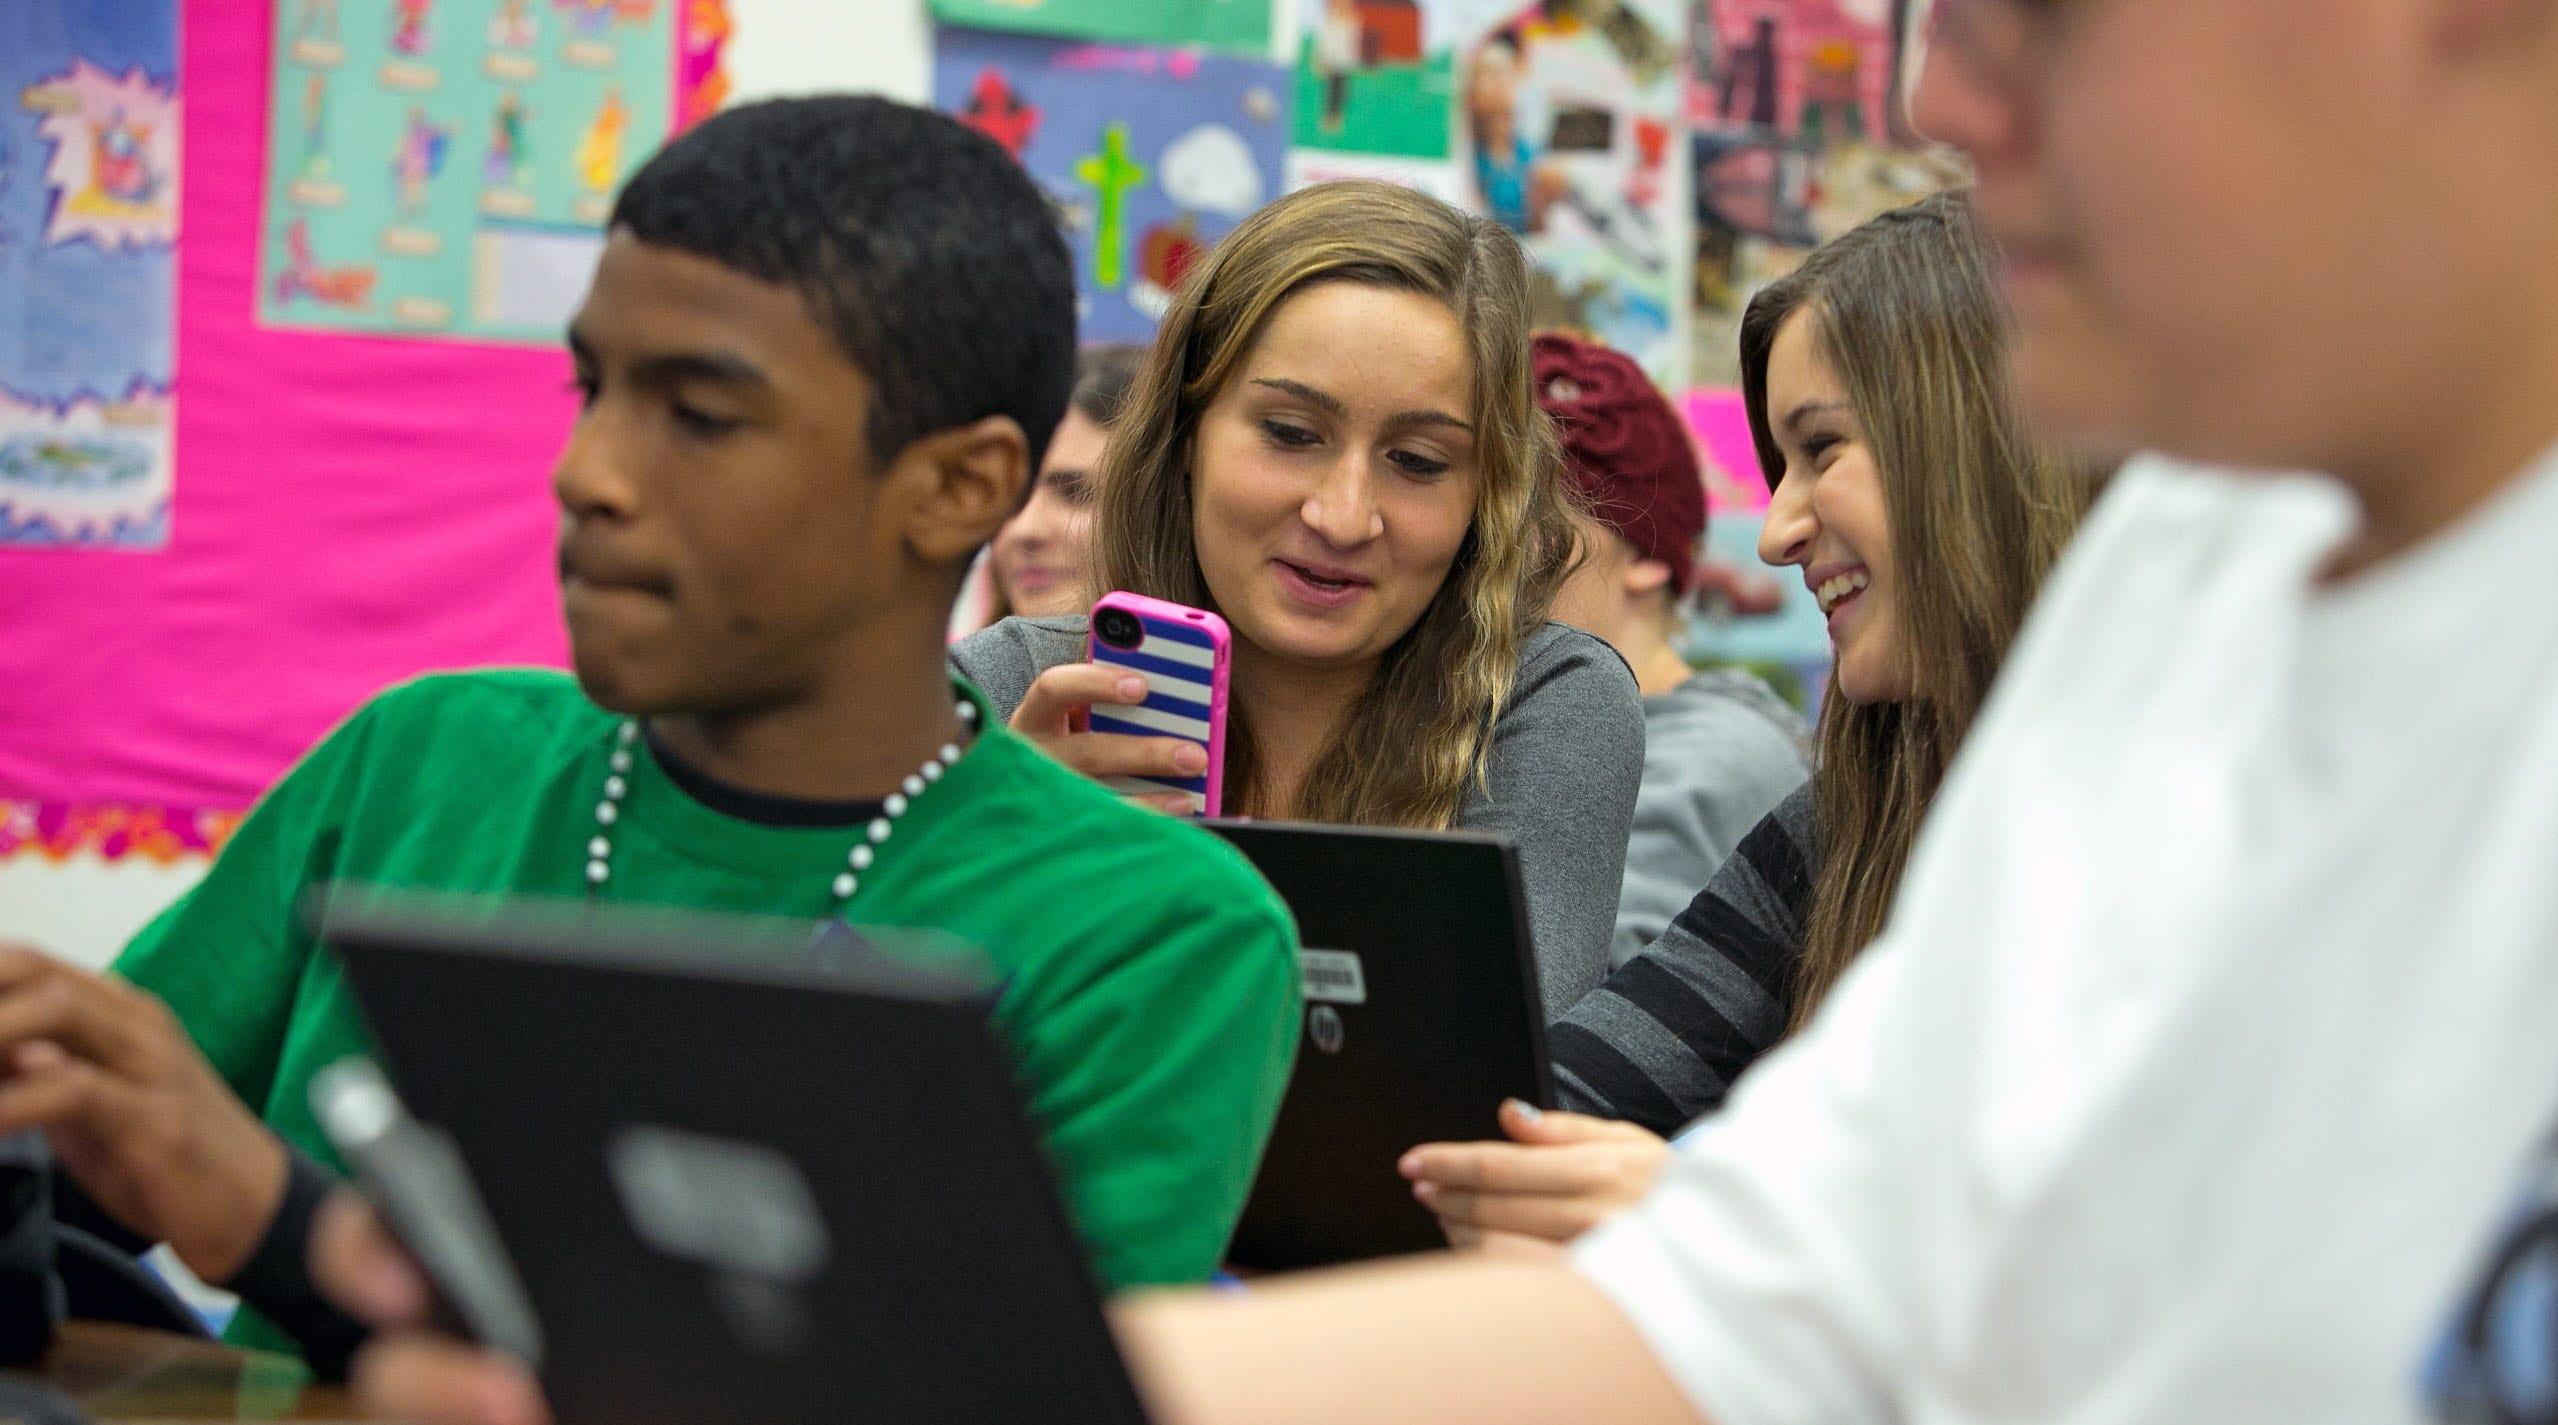 At Willis Junior High school in Chandler, Ariz. on Dec. 19, 2012.